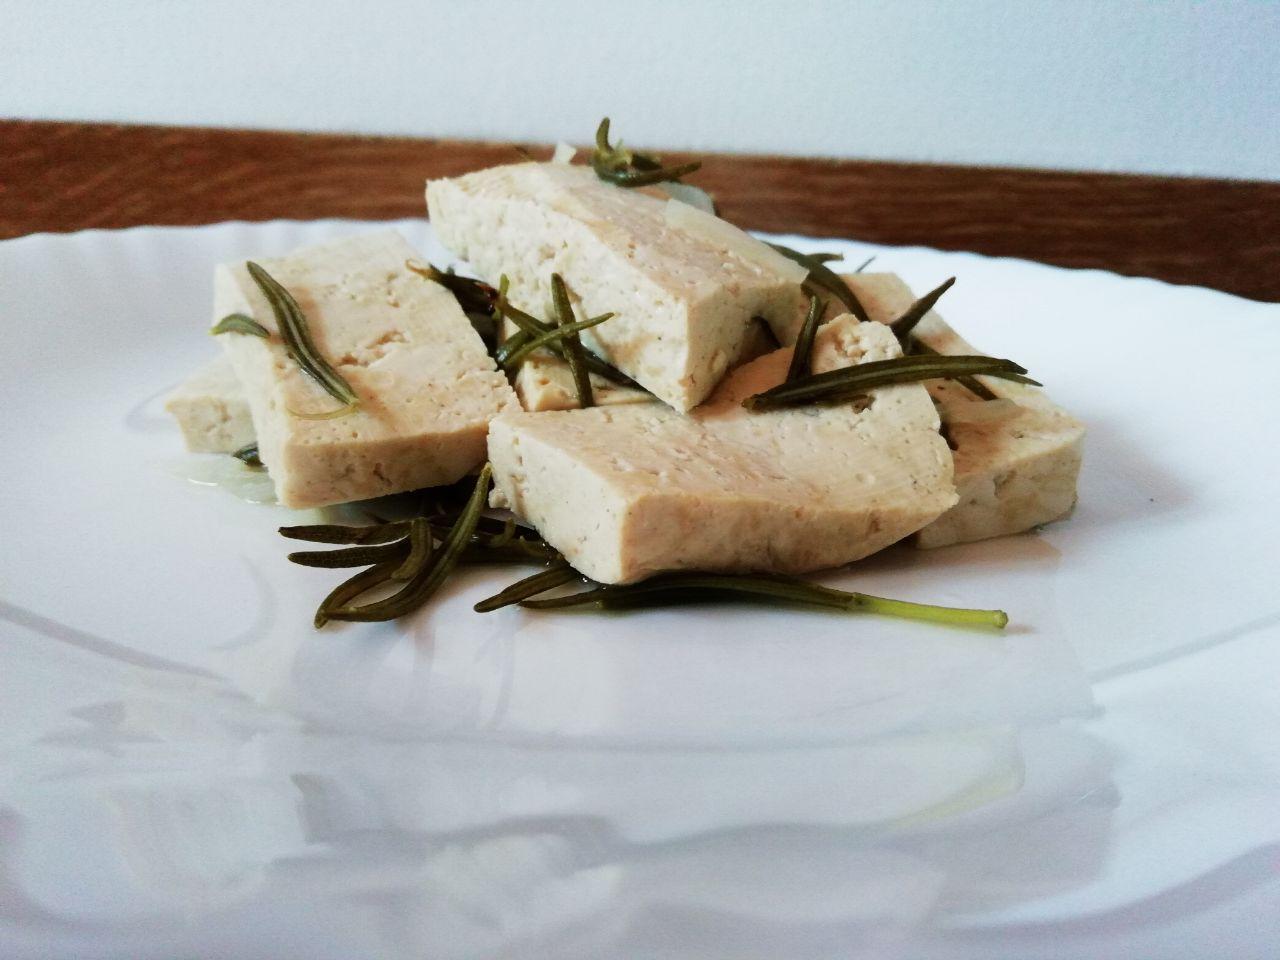 Ricette vegetariane: tofu al rosmarino!